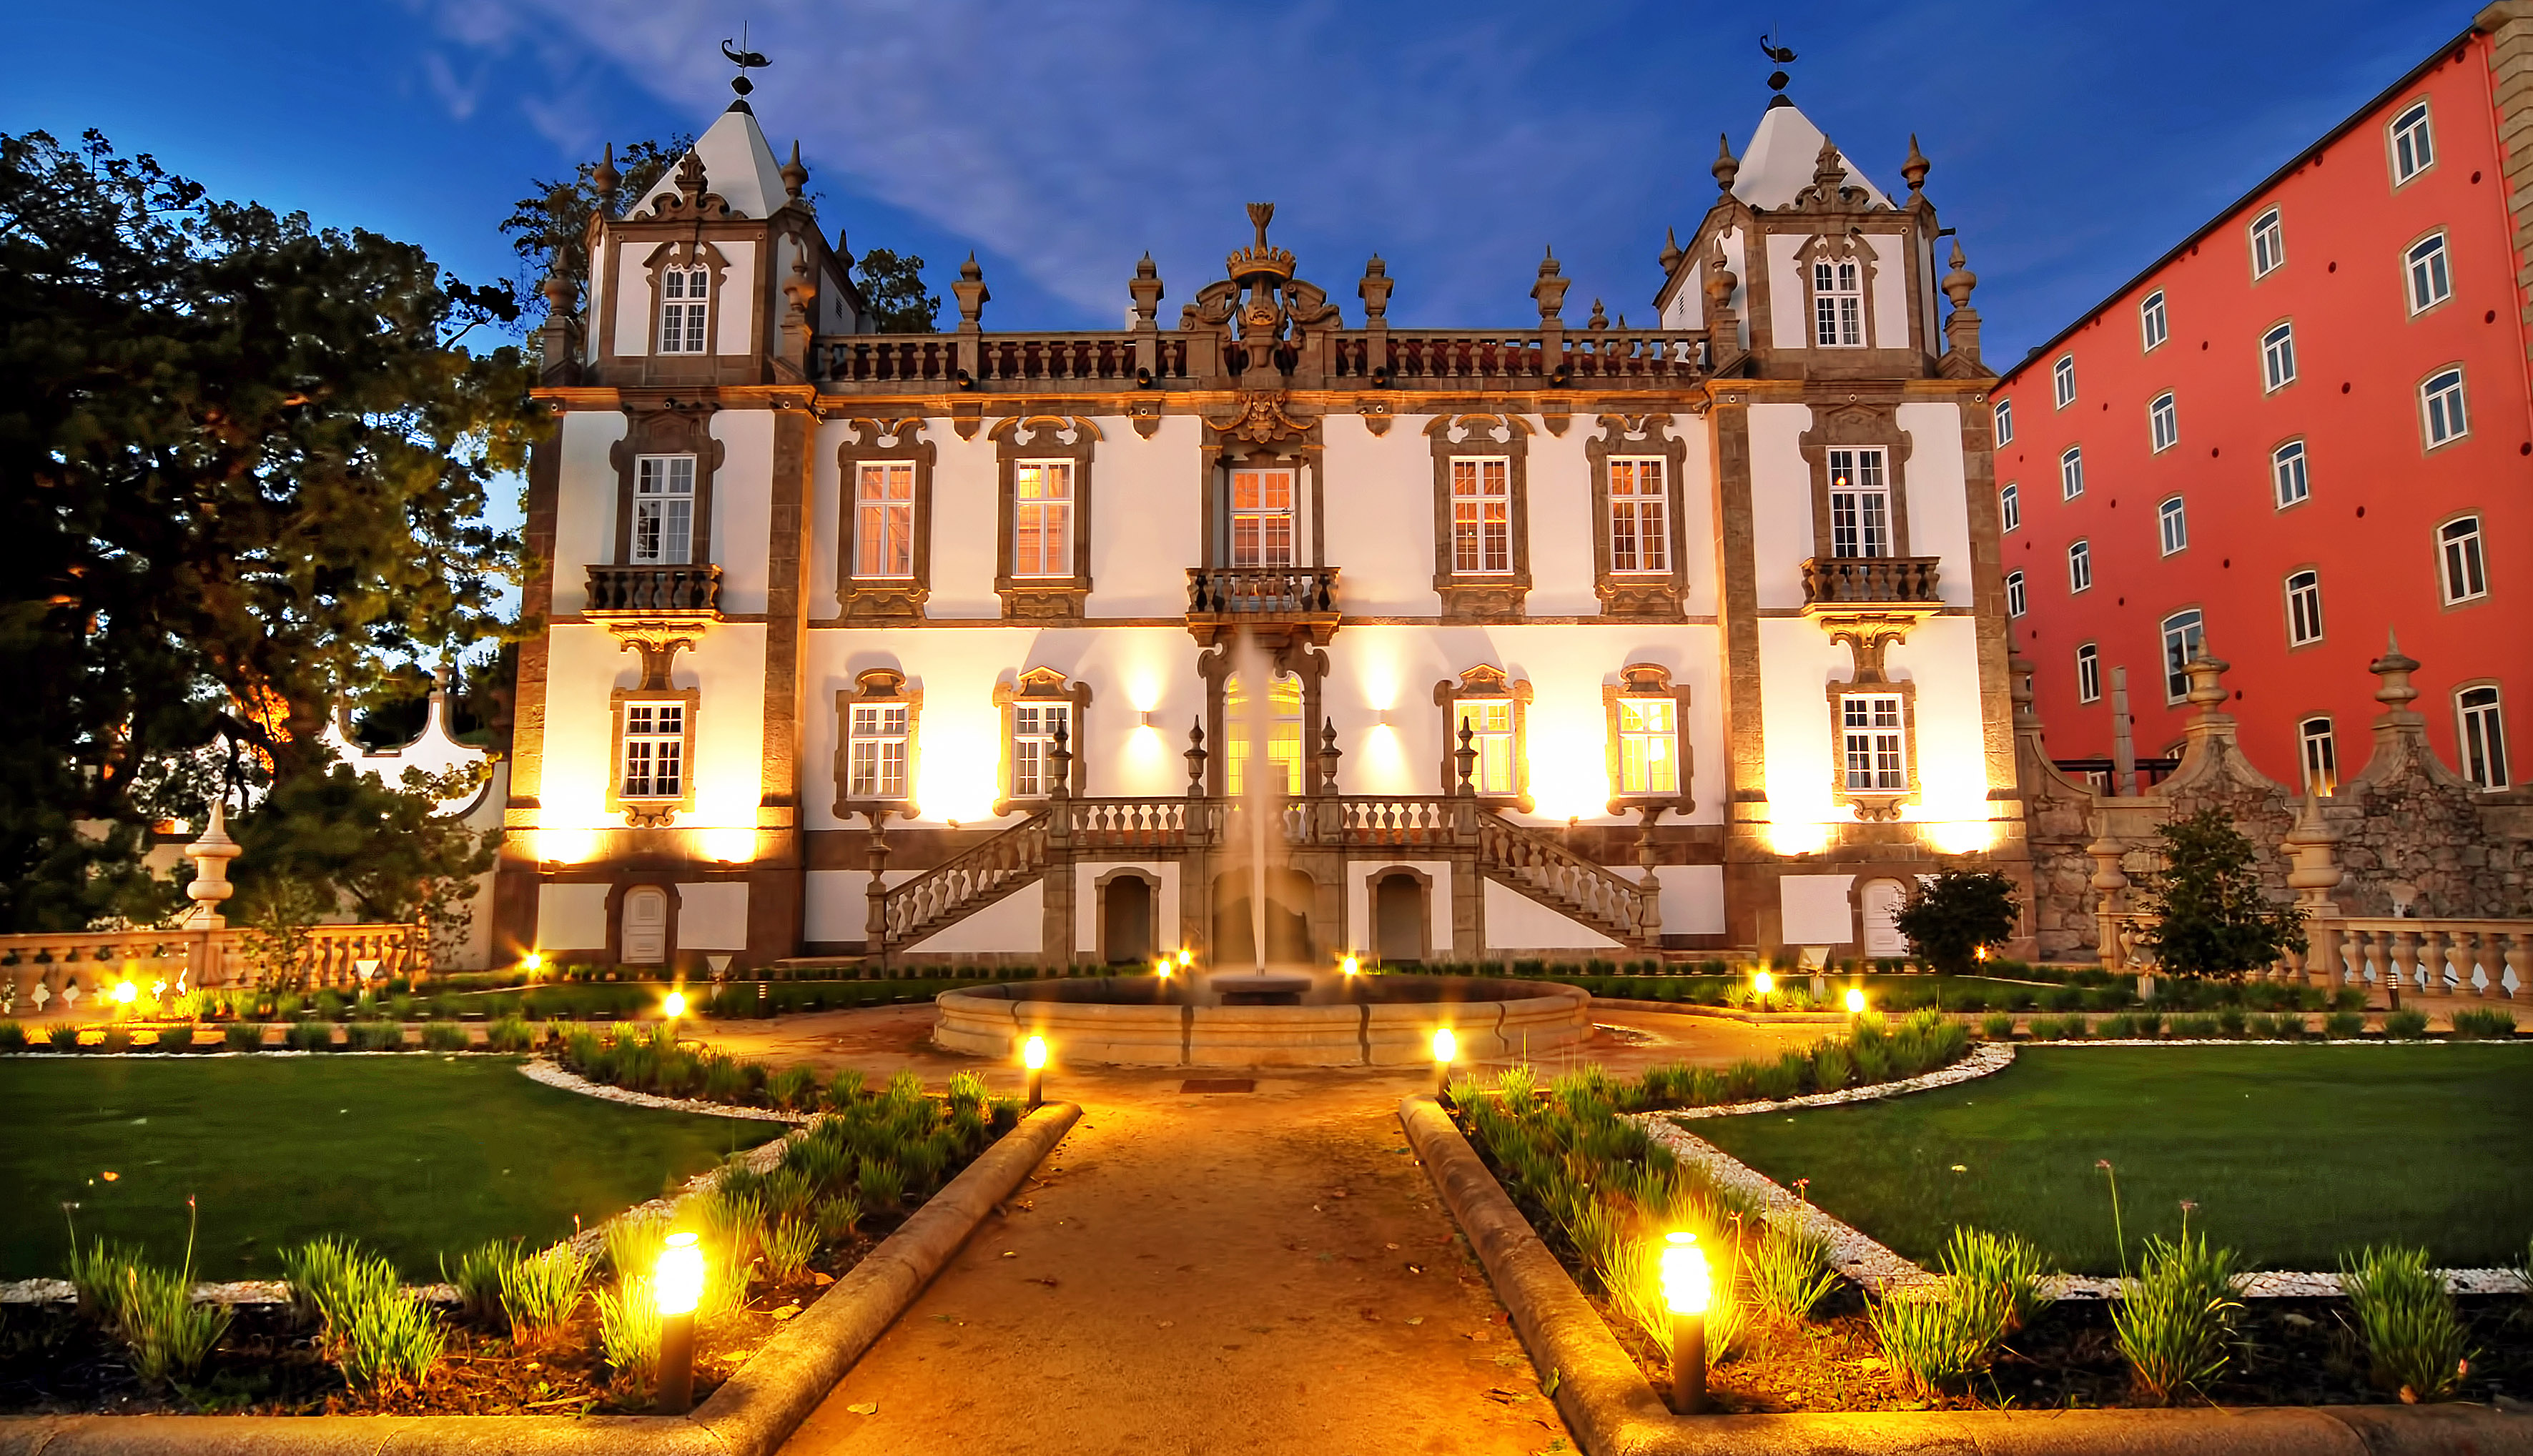 File:Pousada do Palácio do Freixo - Porto (1).jpg - Wikimedia Commons